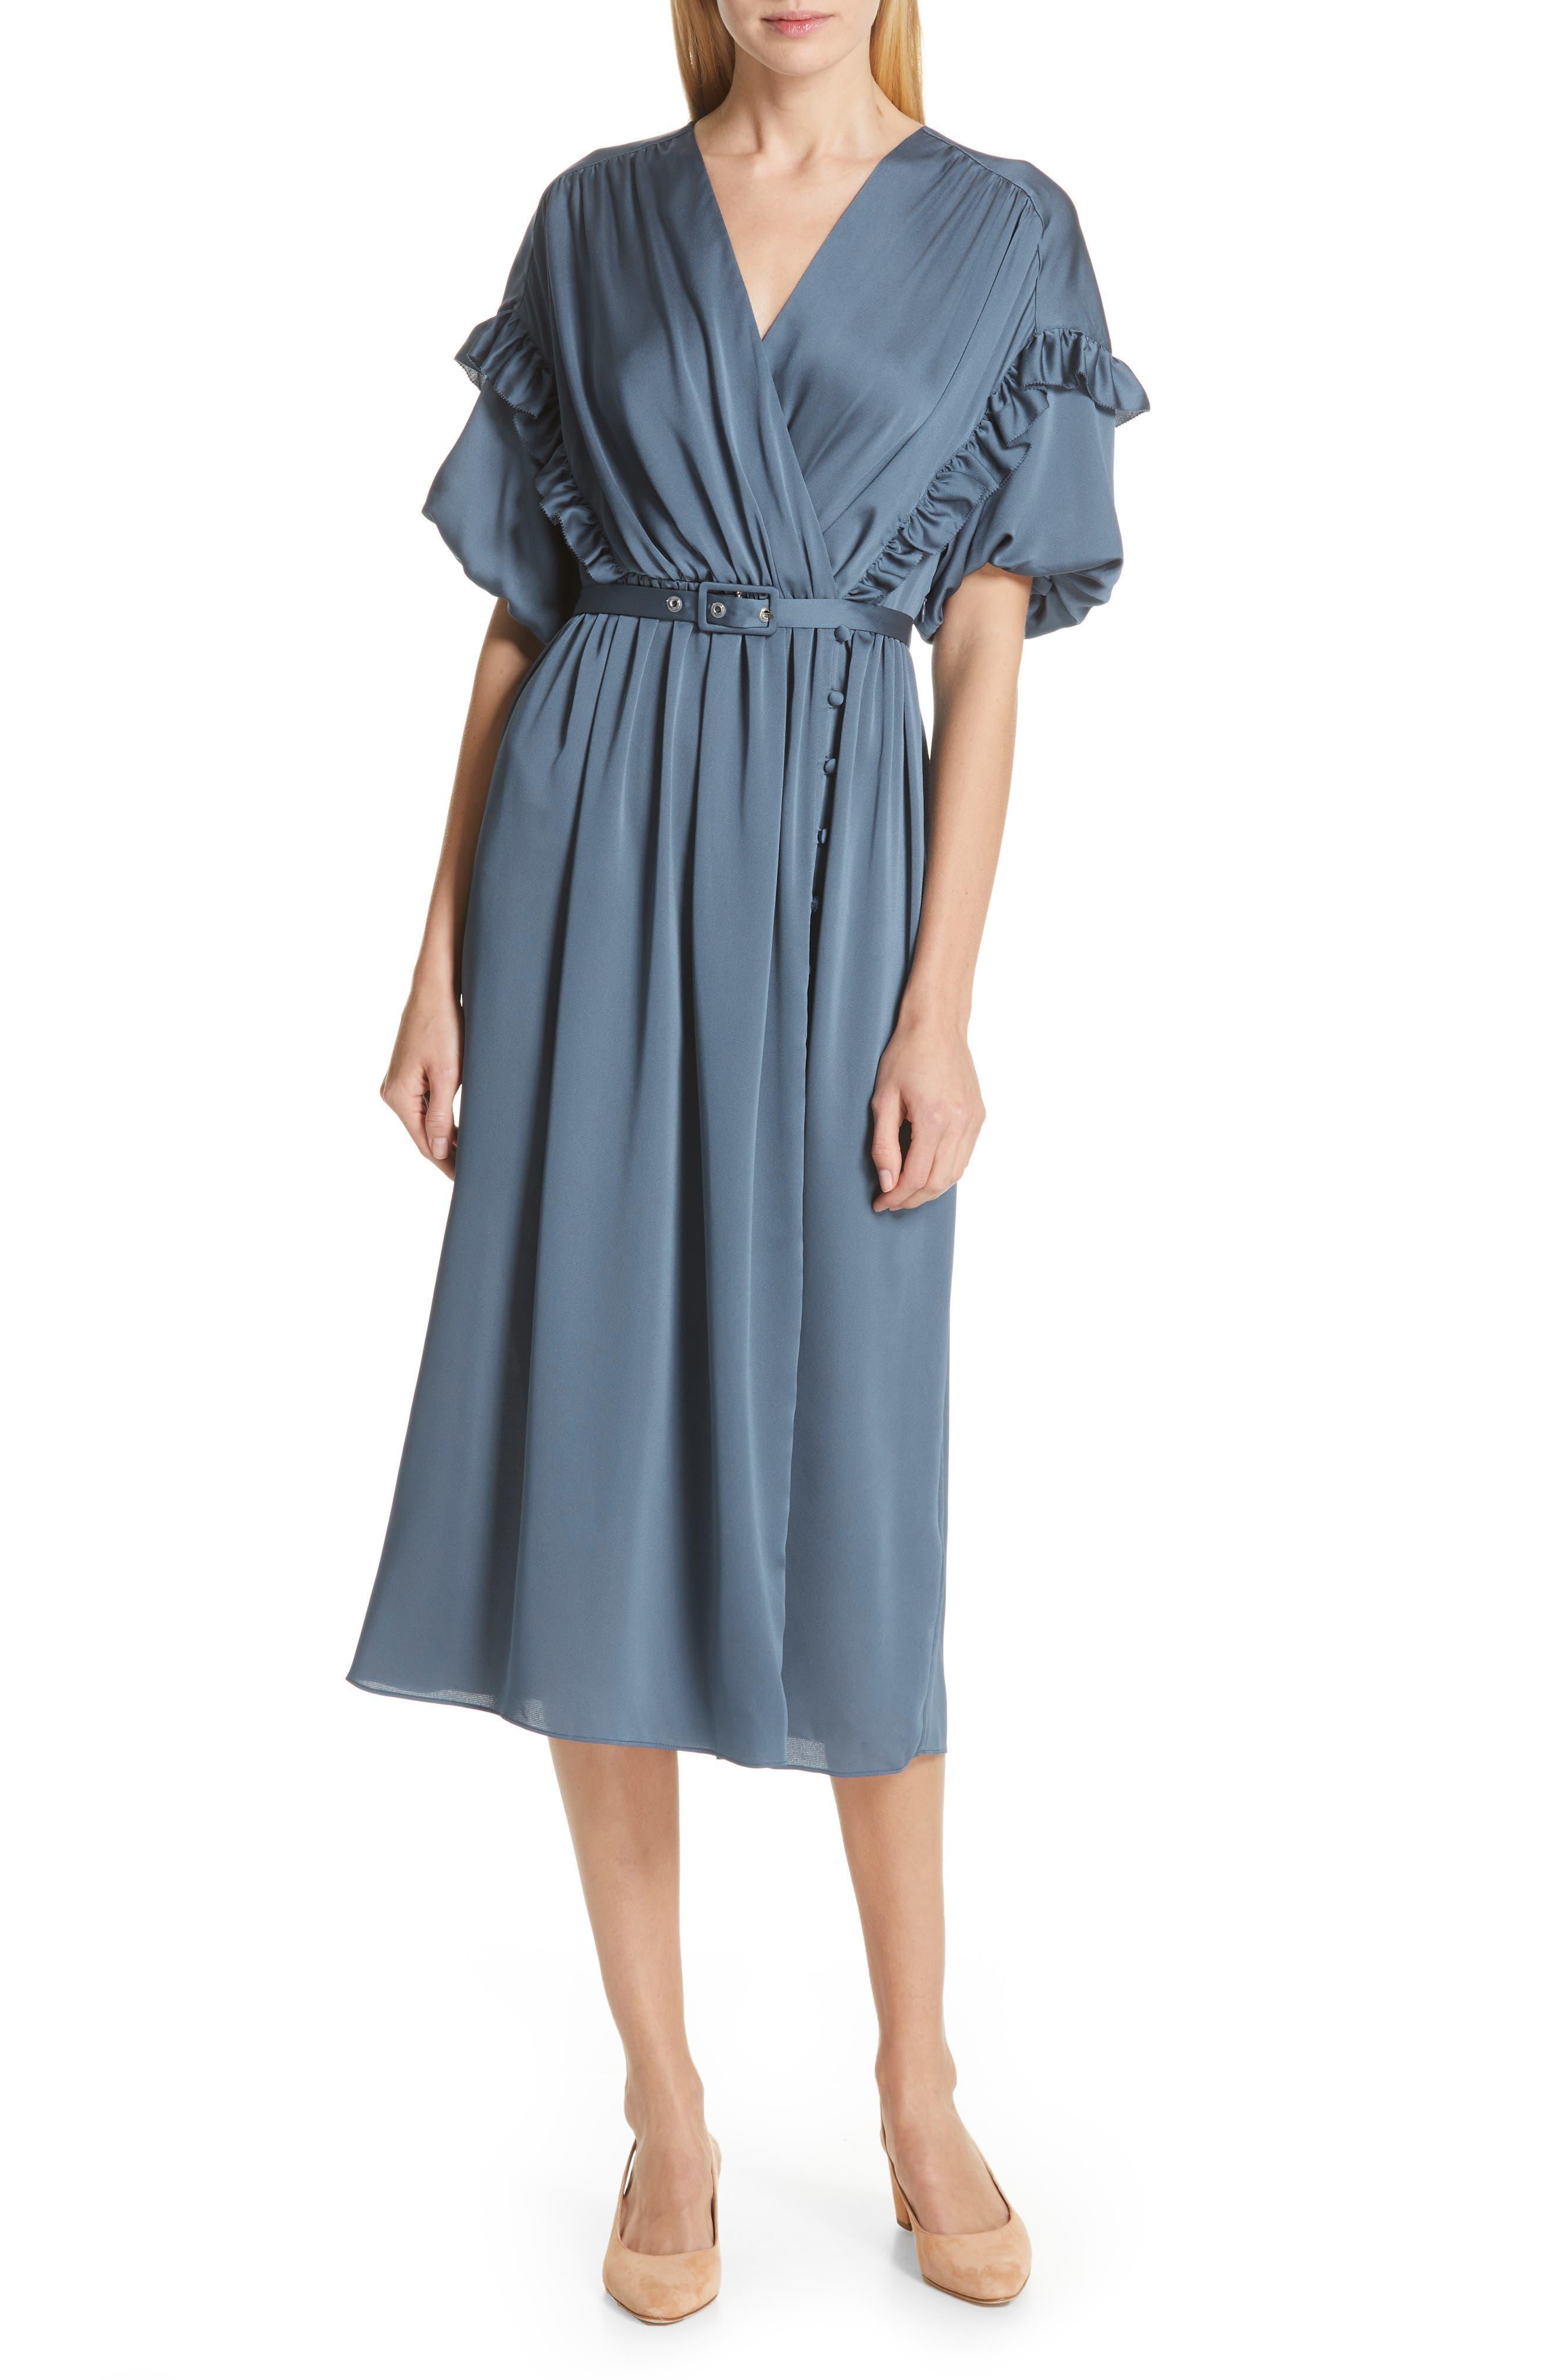 Kate Spade New York Satin Midi Dress, Blue